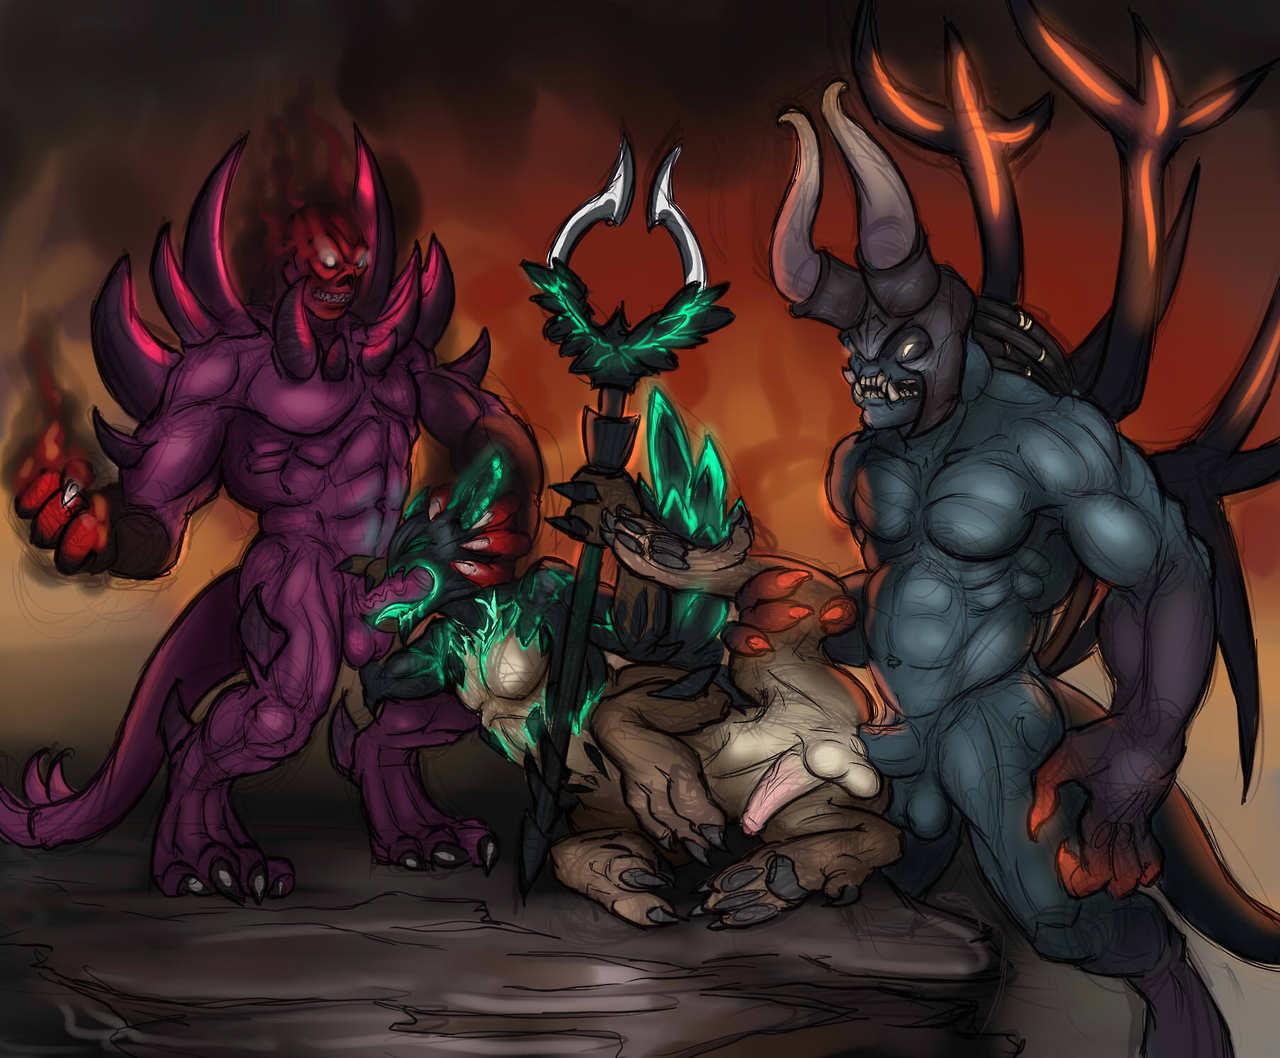 facility slayer the entered the has warning Mimic hat dark souls 3